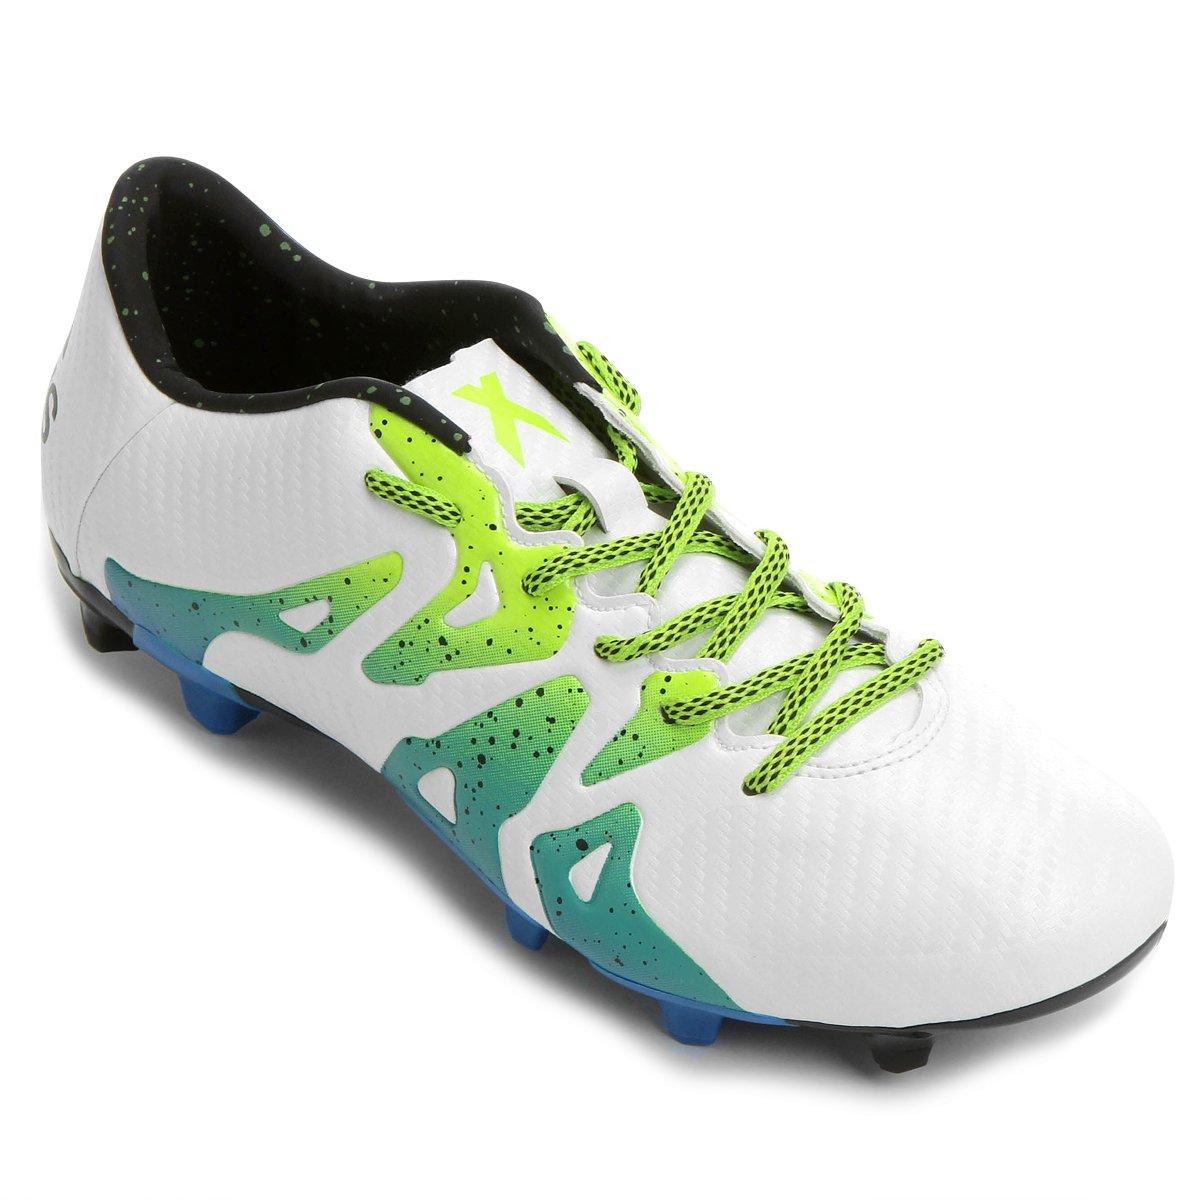 03c009e07a64e Chuteira Adidas X 15.3 FG Campo - Compre Agora